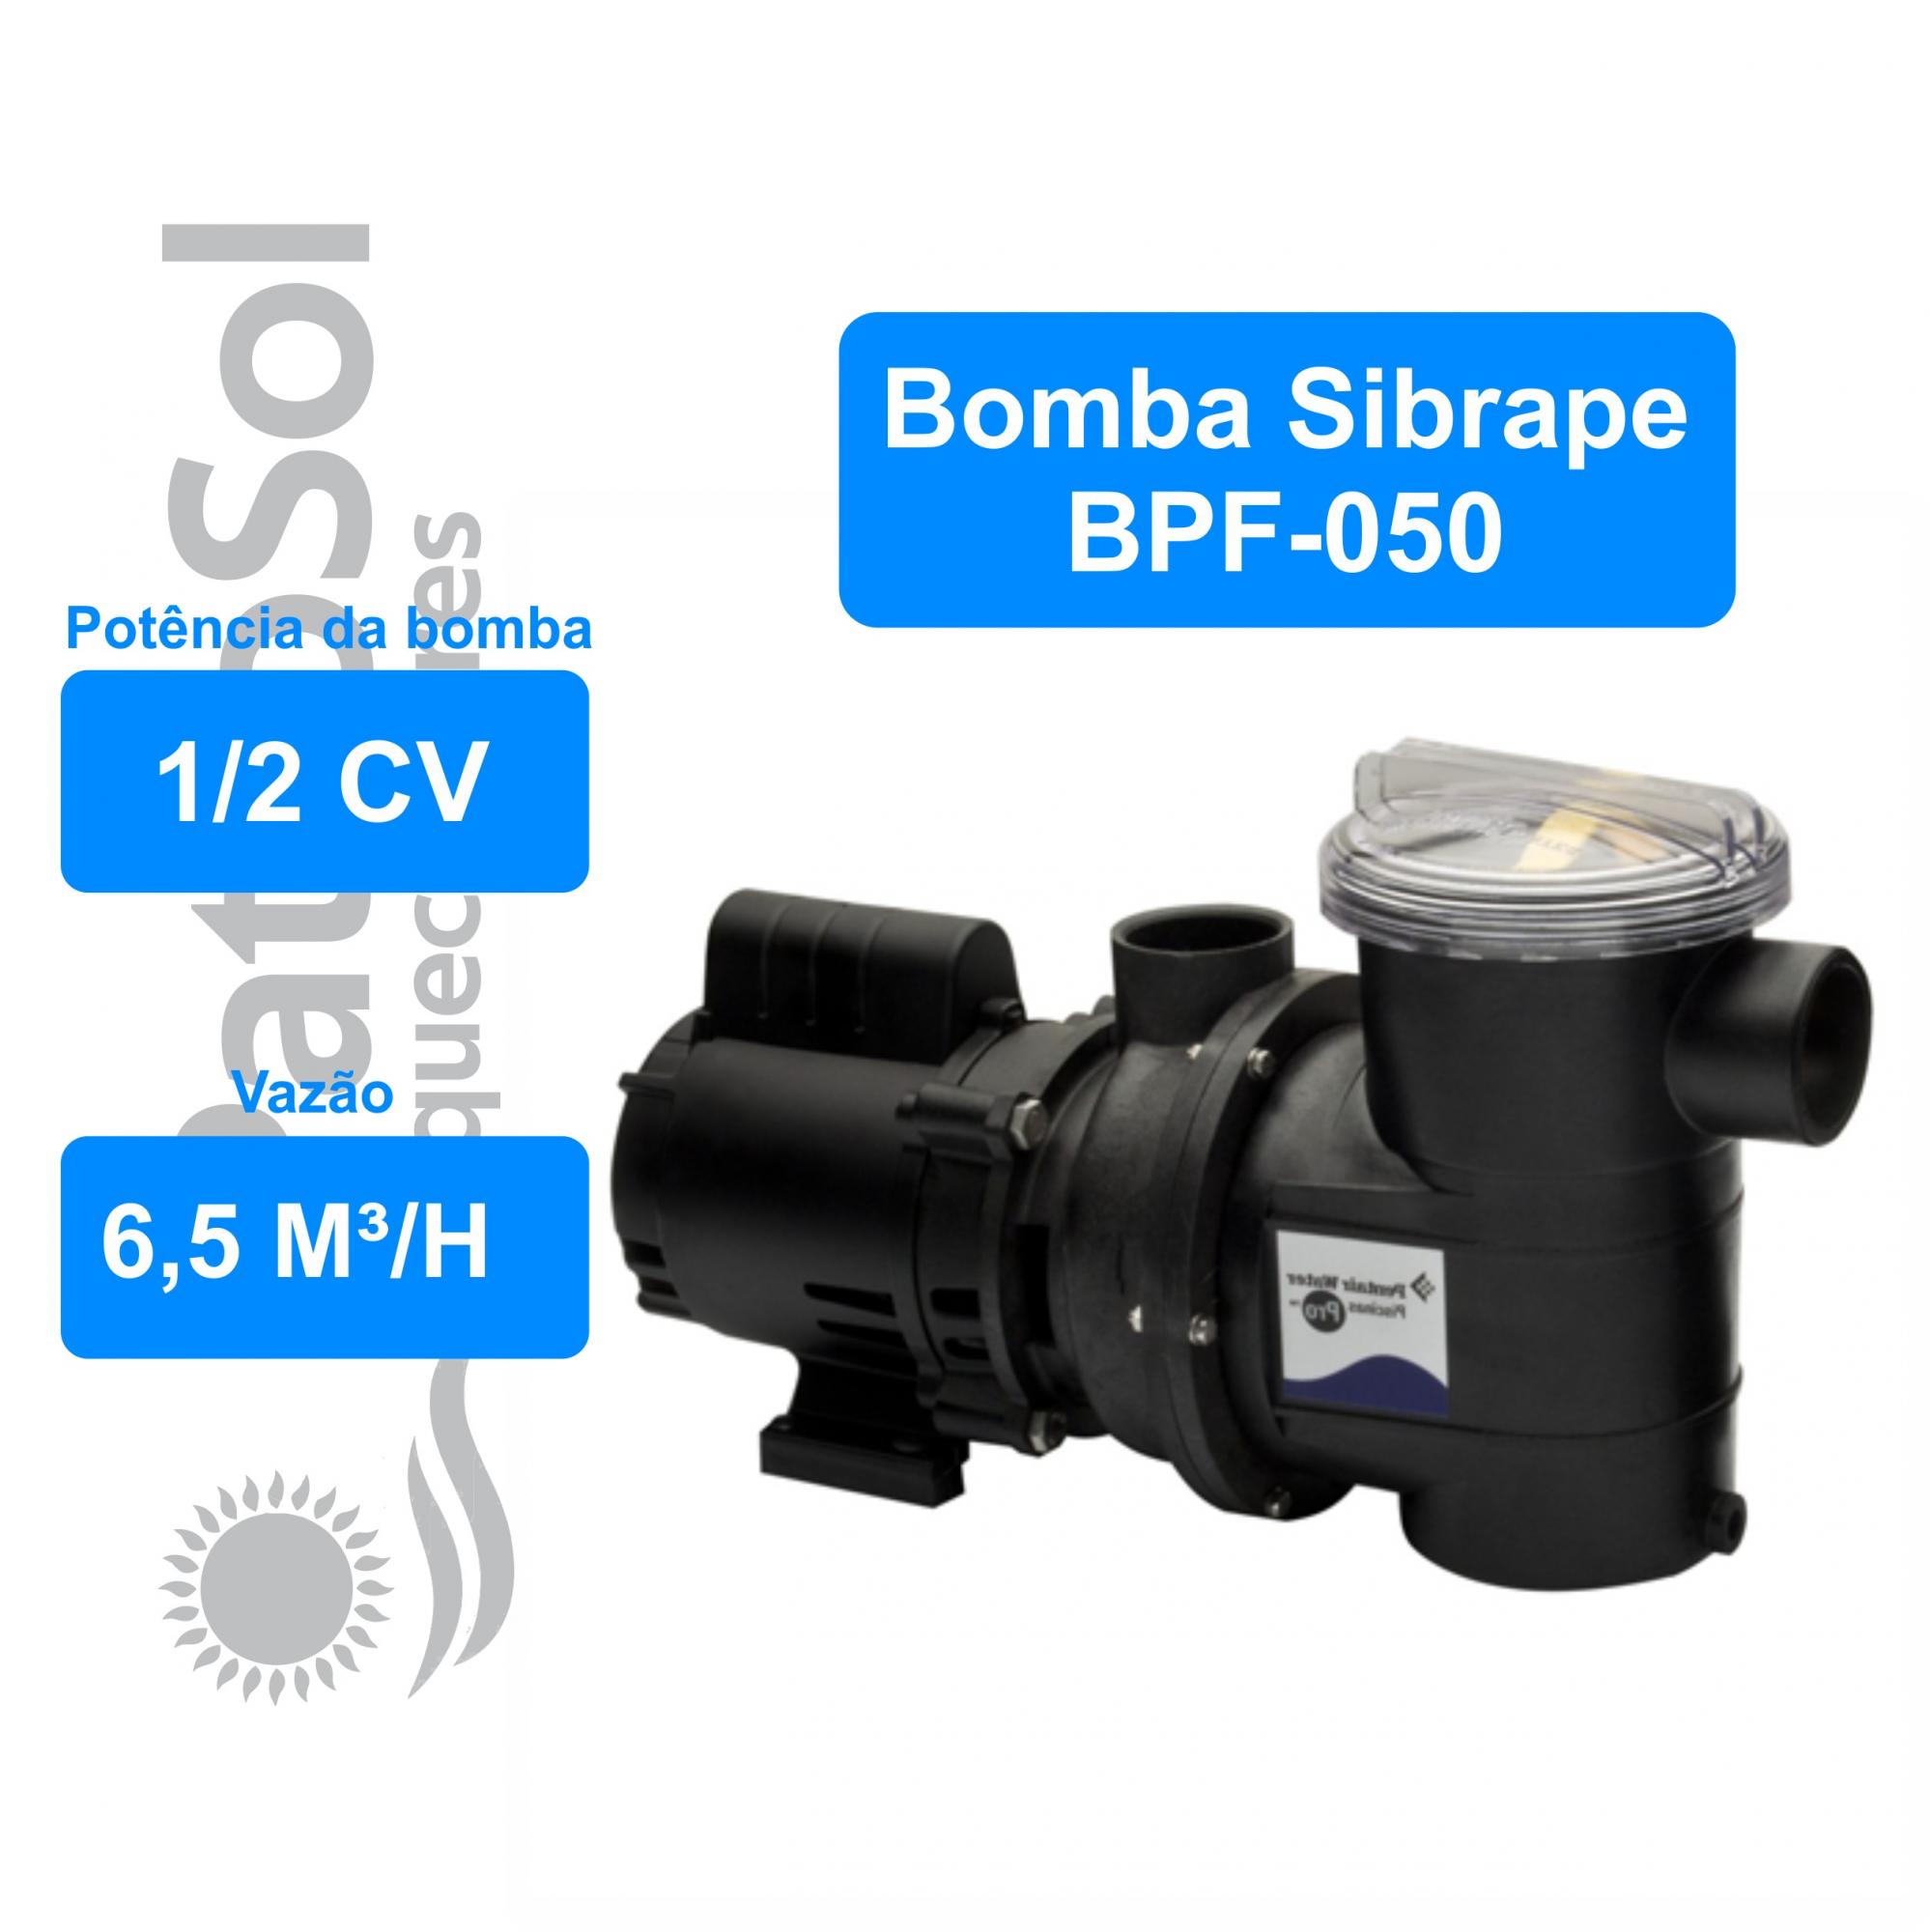 Moto Bomba Para Piscina Sibrape 1/2 Cv - Motor Weg 110/220 Volts